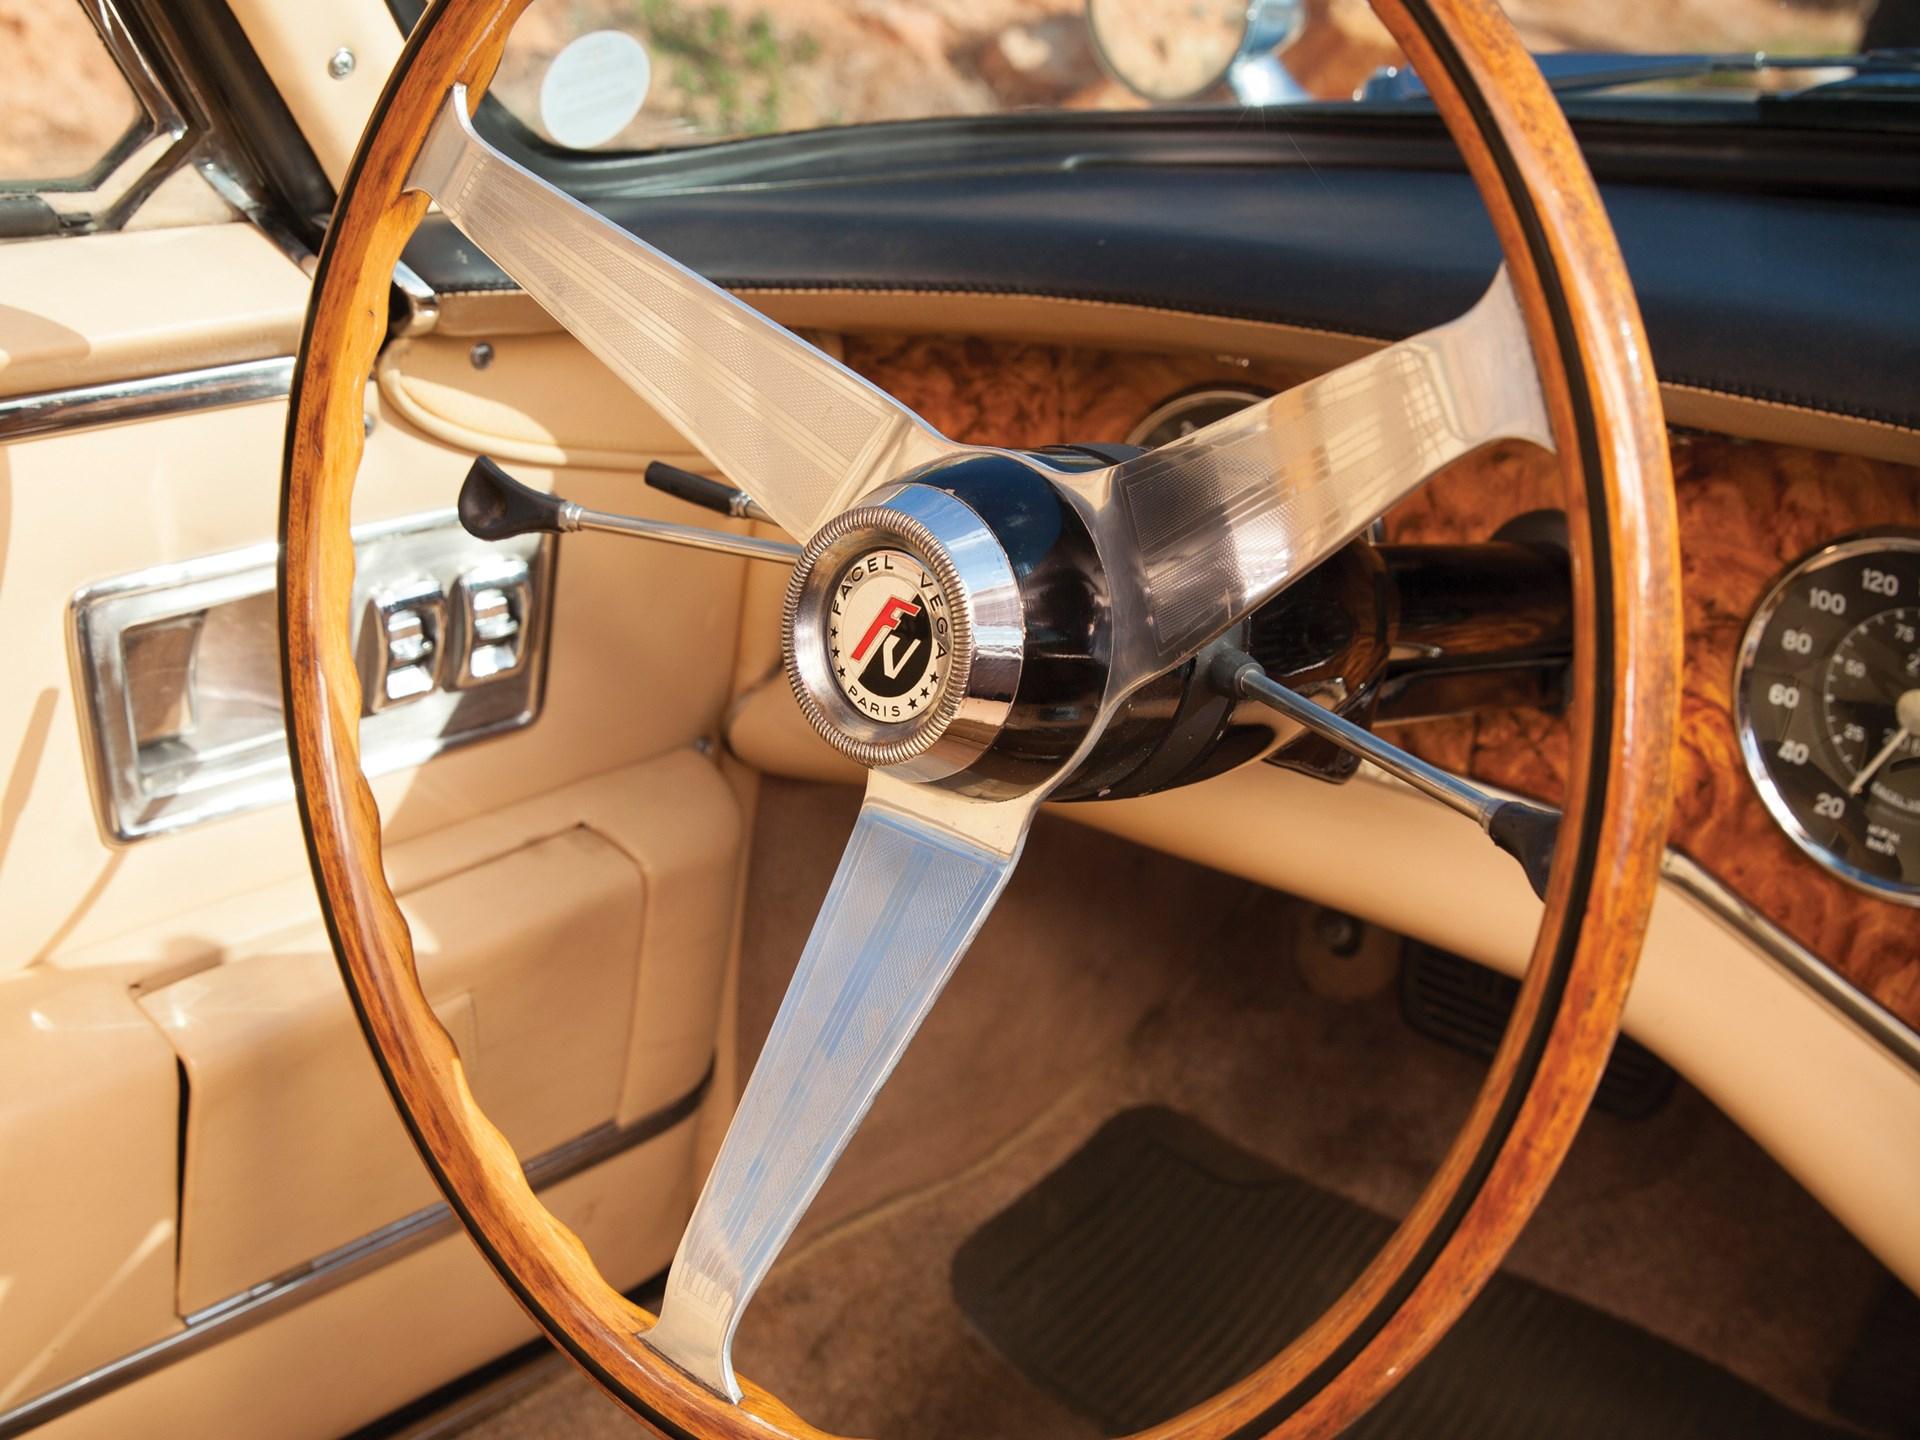 1963 Facel Vega Facel II